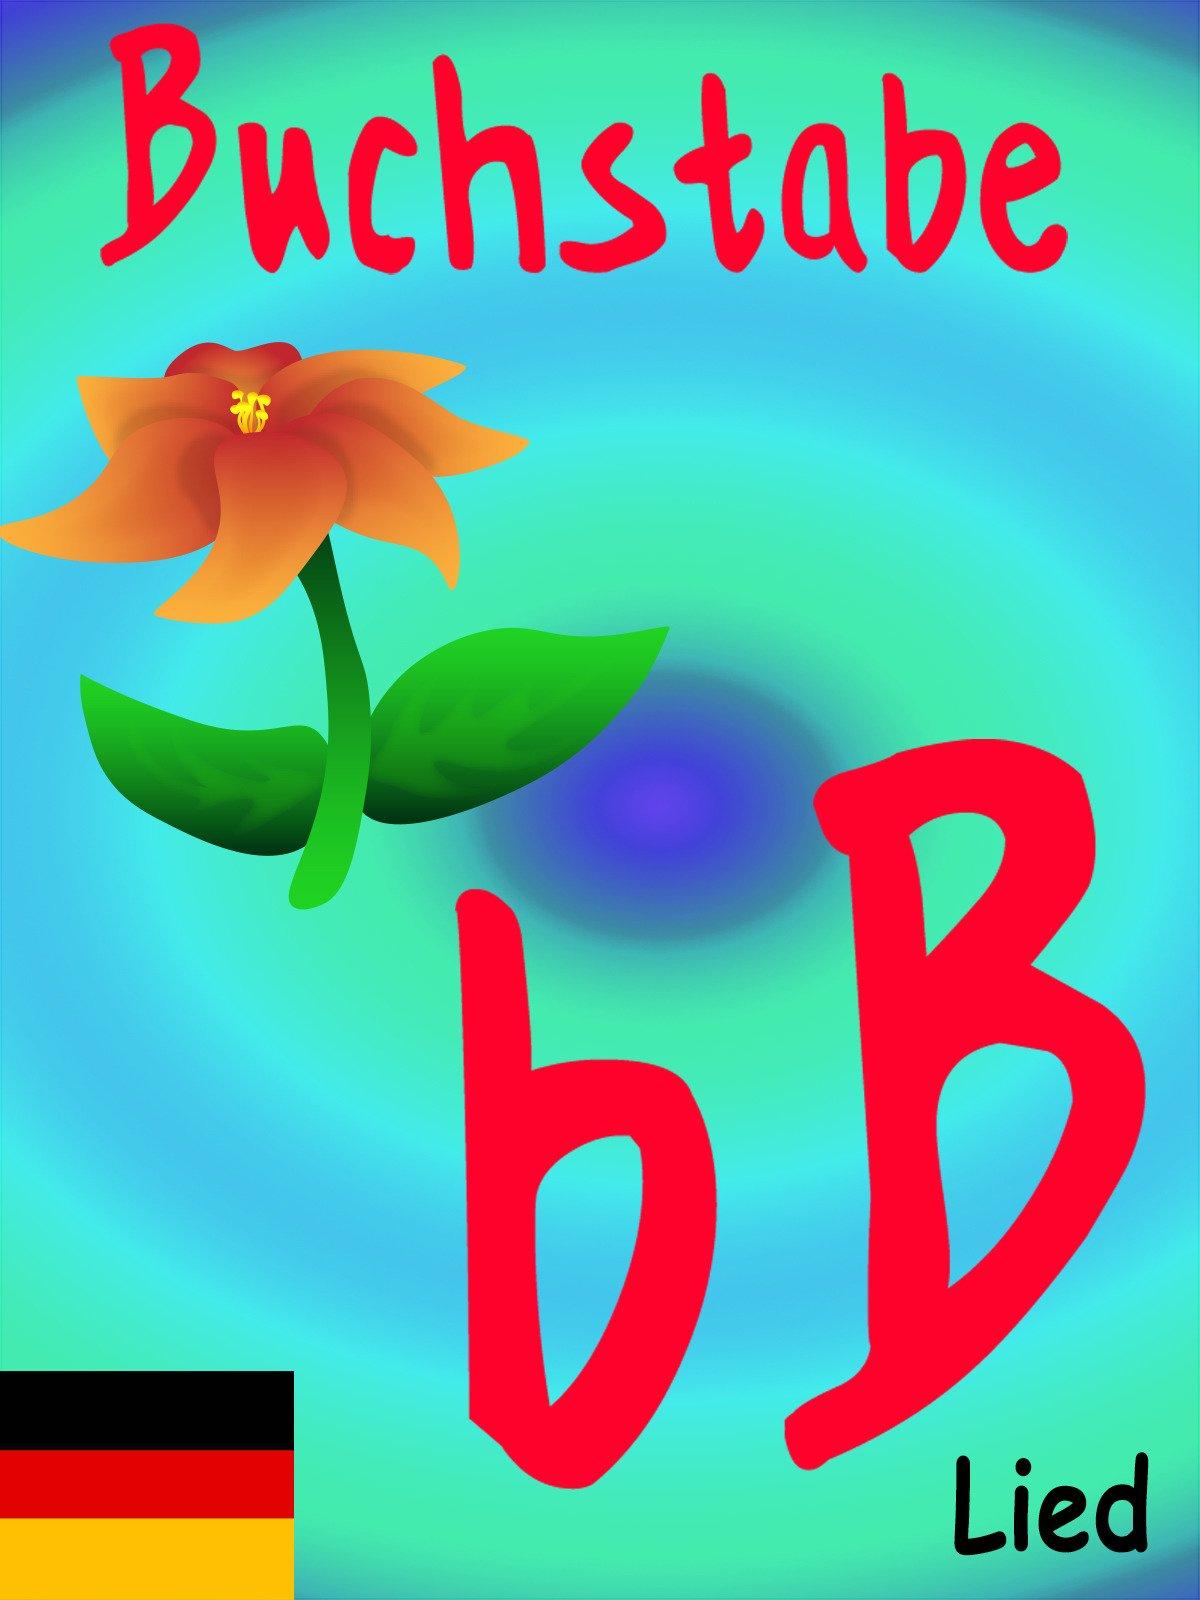 Clip: Buchstabe B Lied